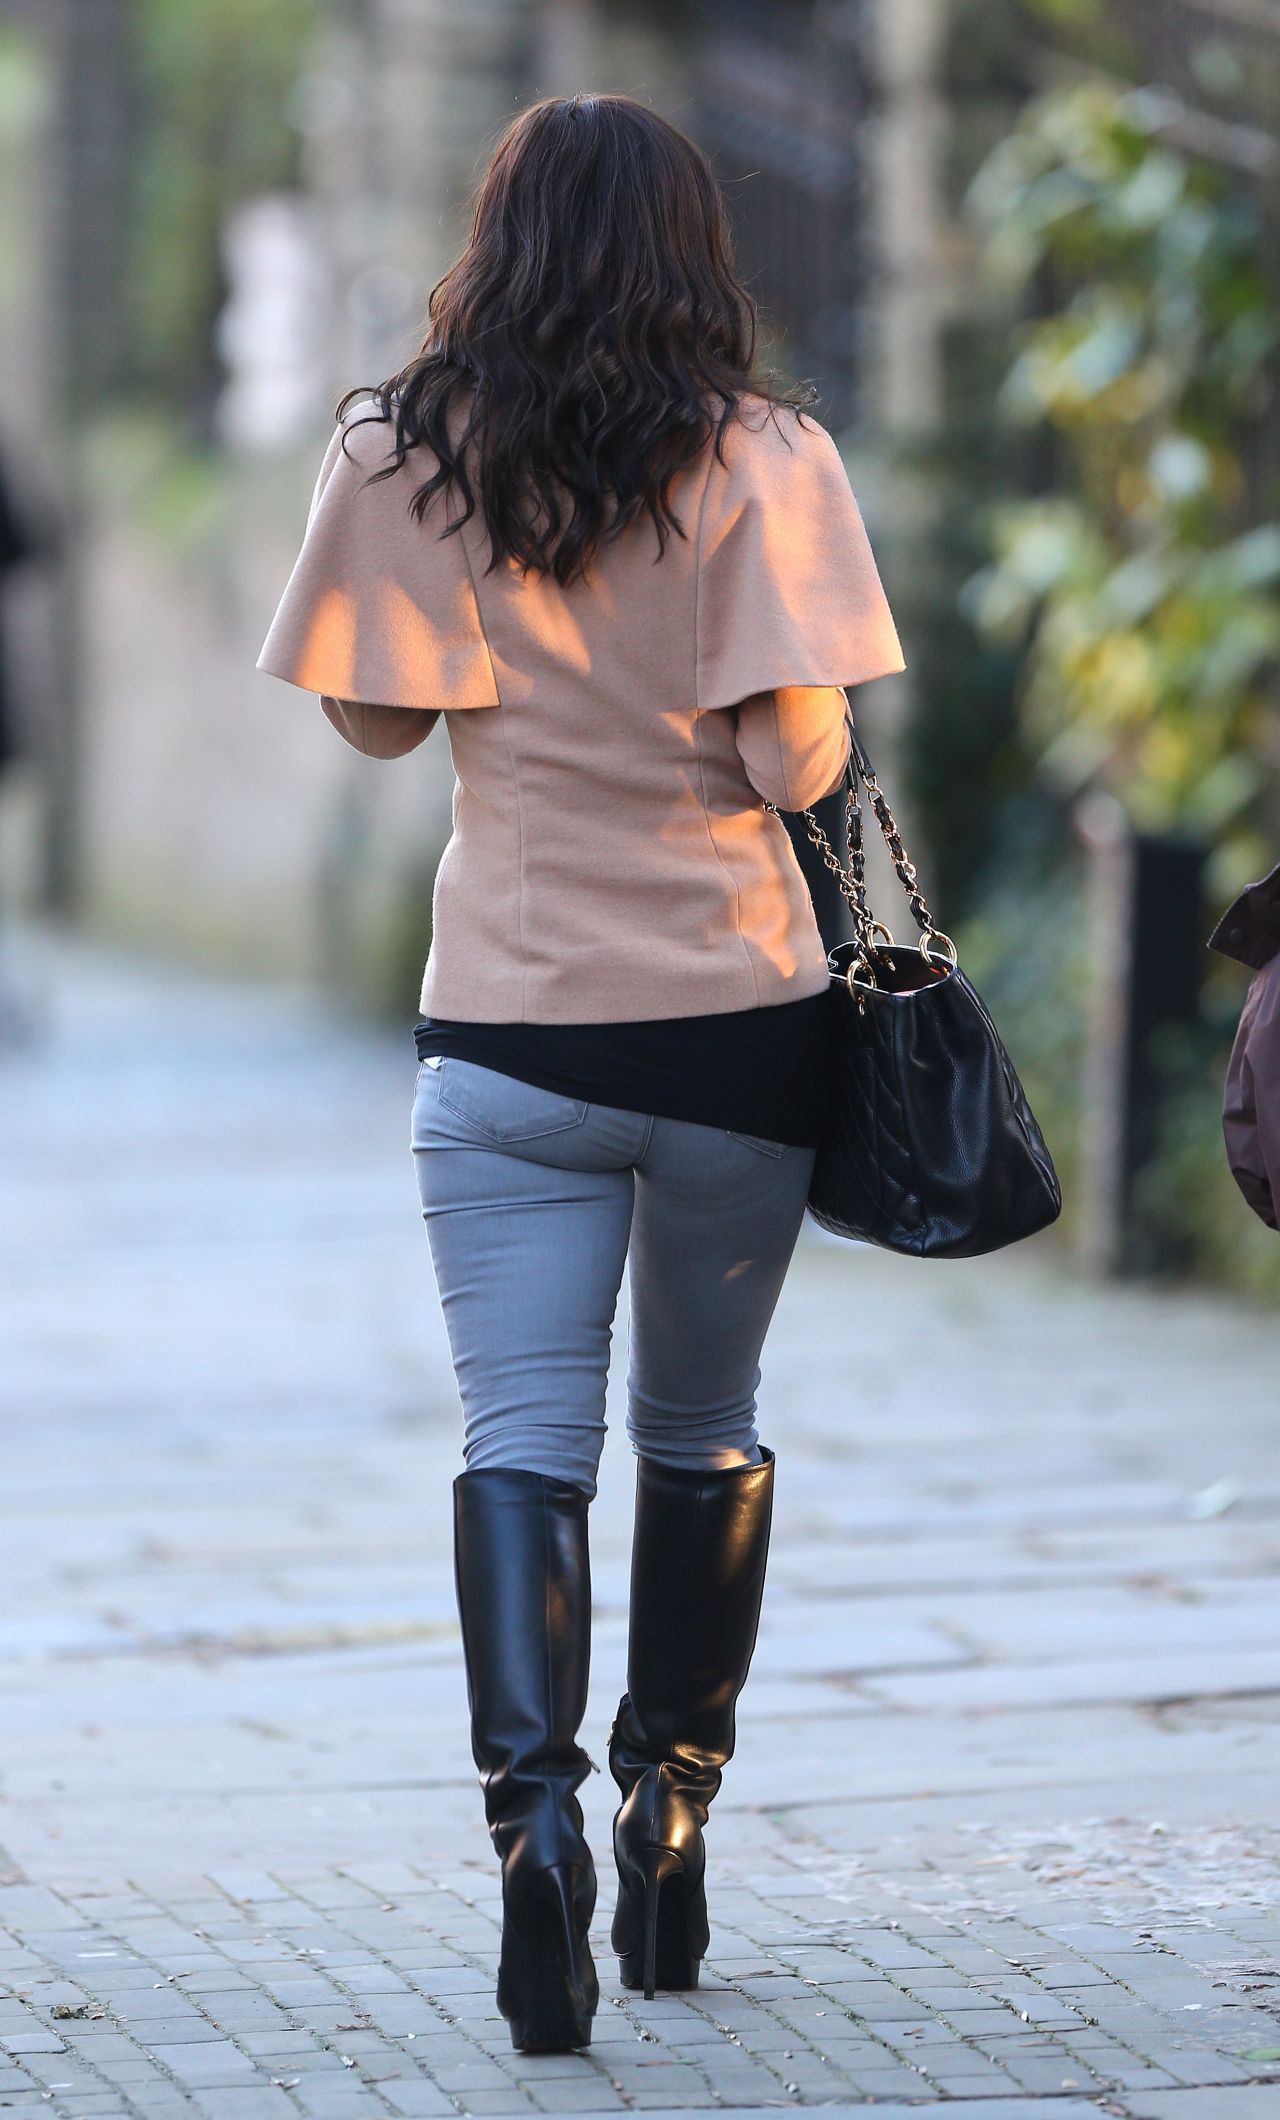 Myleene Klass Street Style In Jeans And Fmb S London